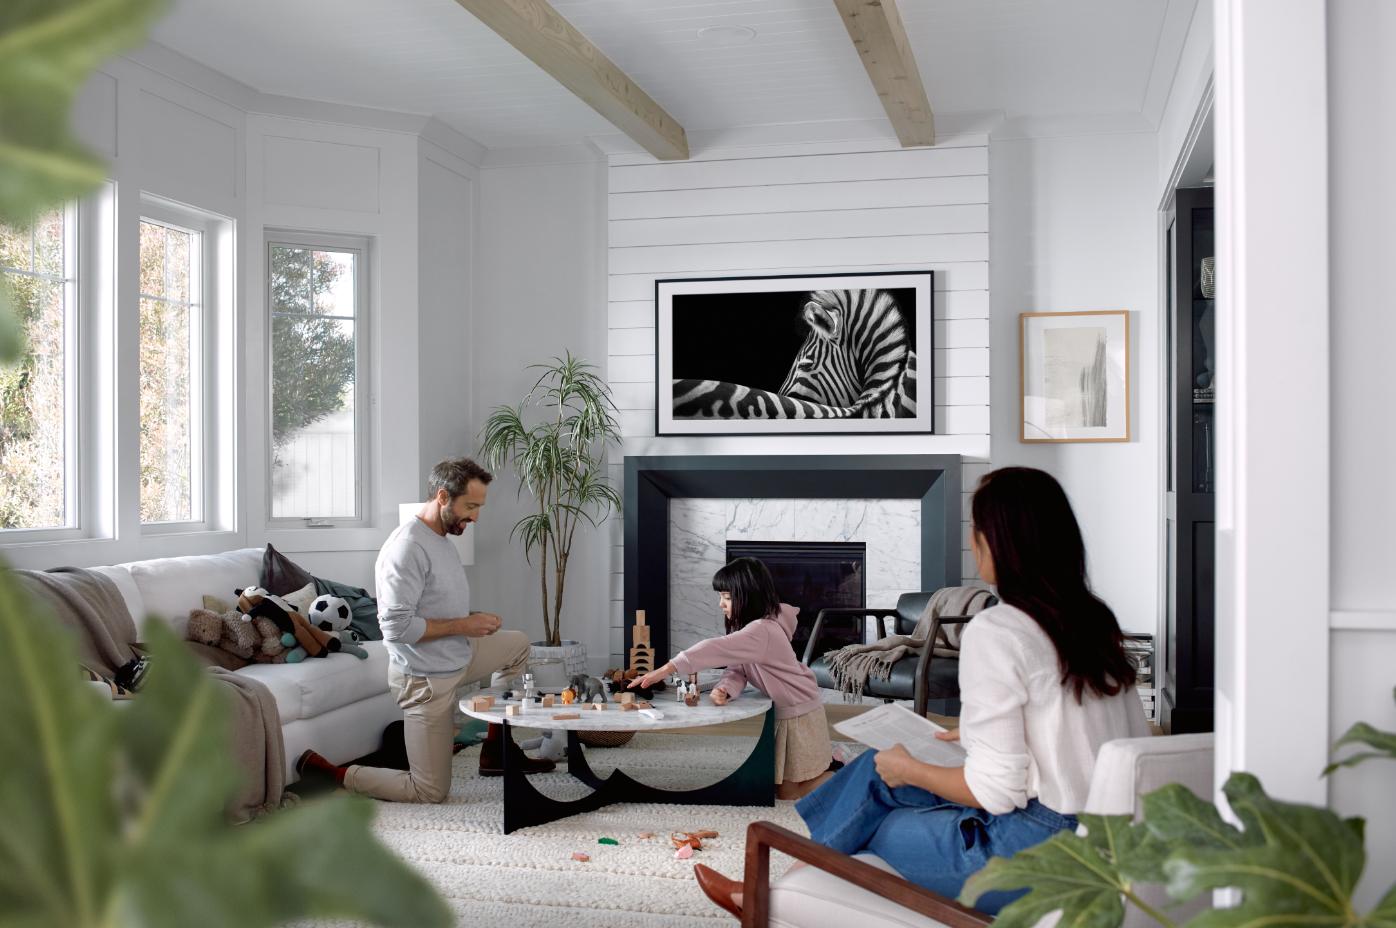 Samsung представила интерьерные телевизоры The Frame с QLED-экранами